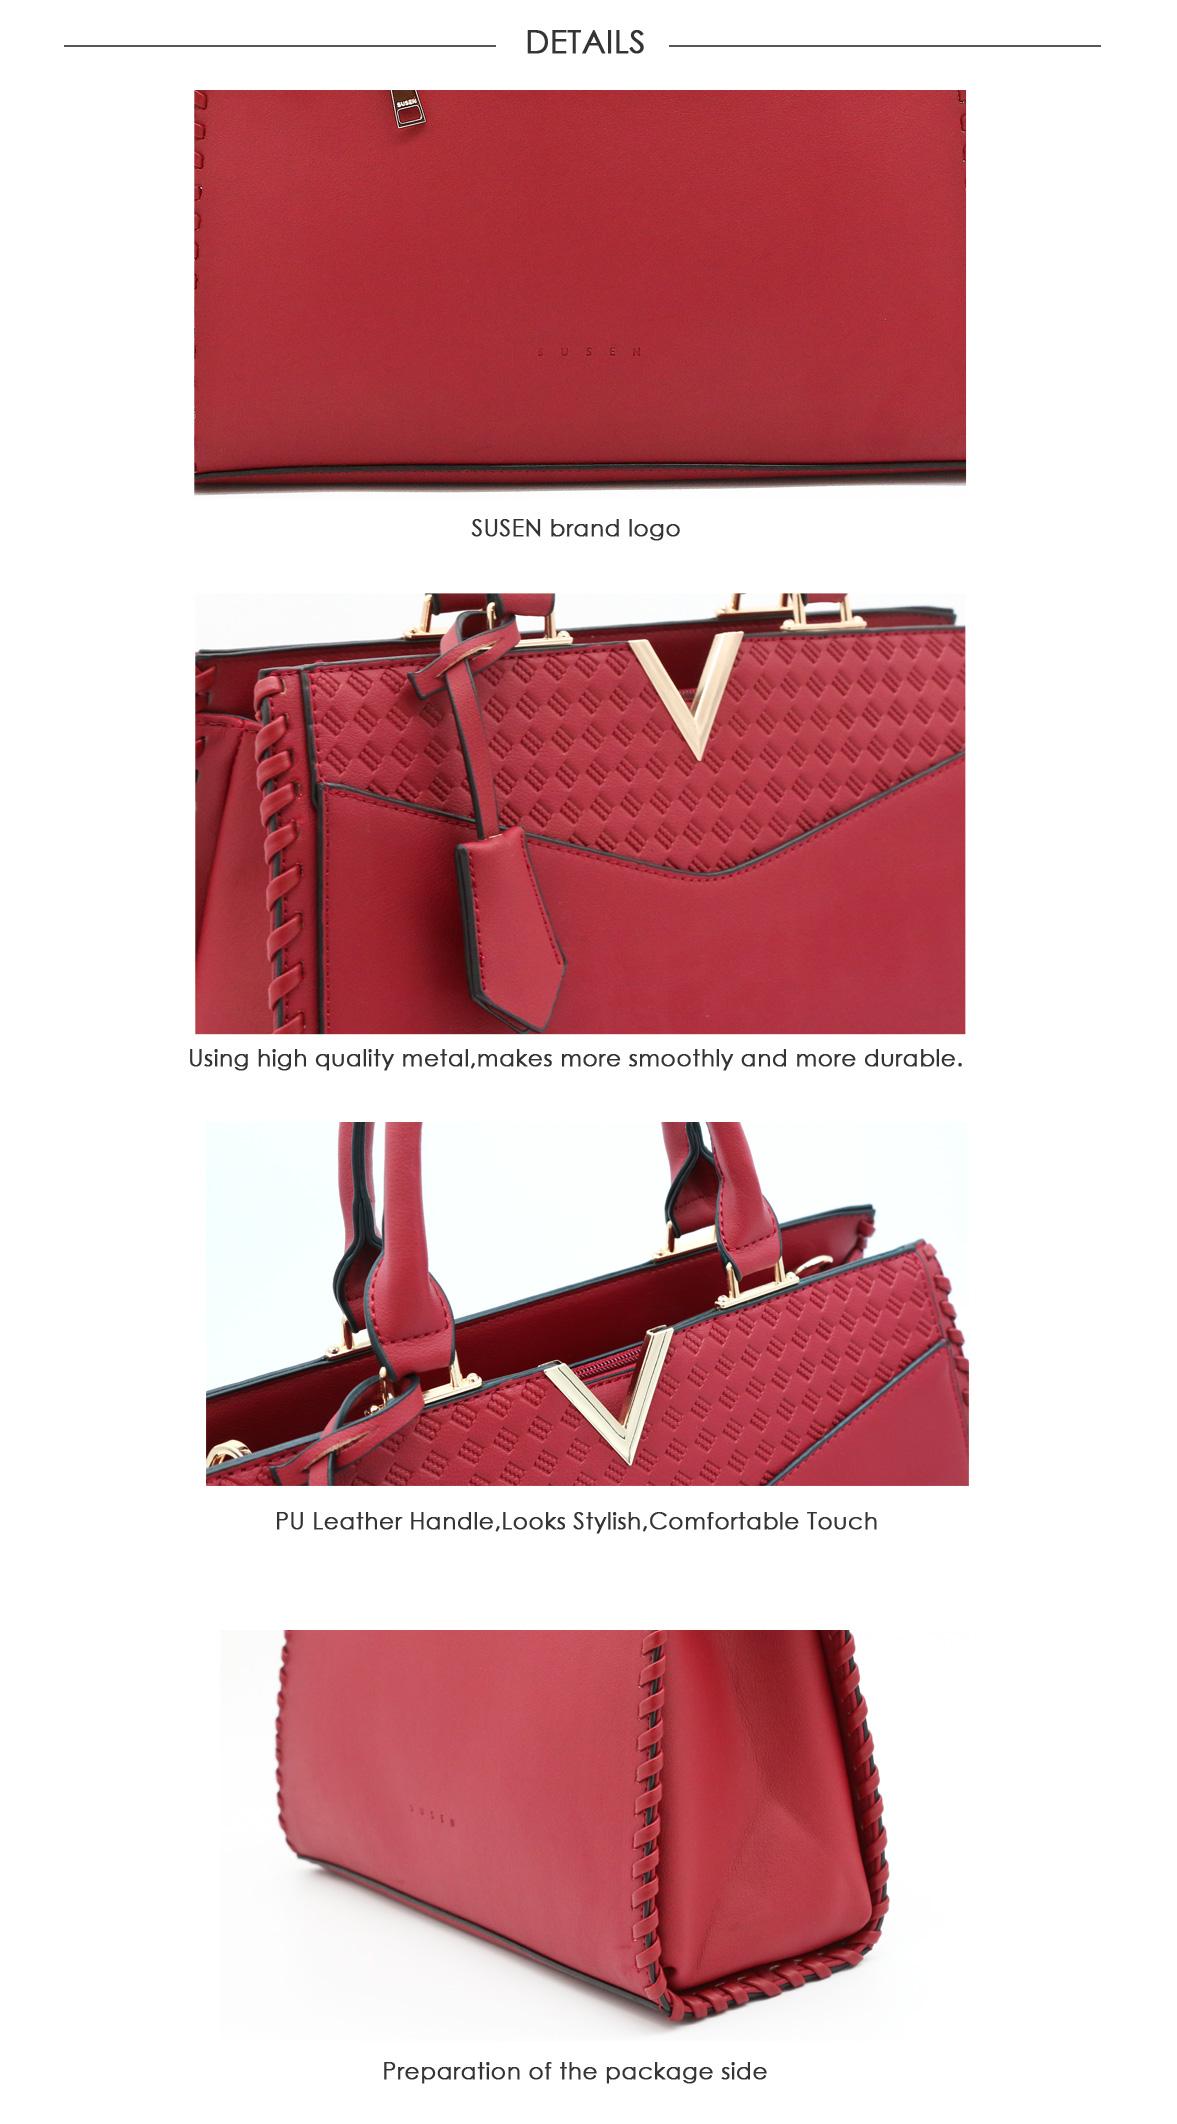 9fa0a3c7ab8e 2018 China supplier custom designer leather satchel bags women handbags